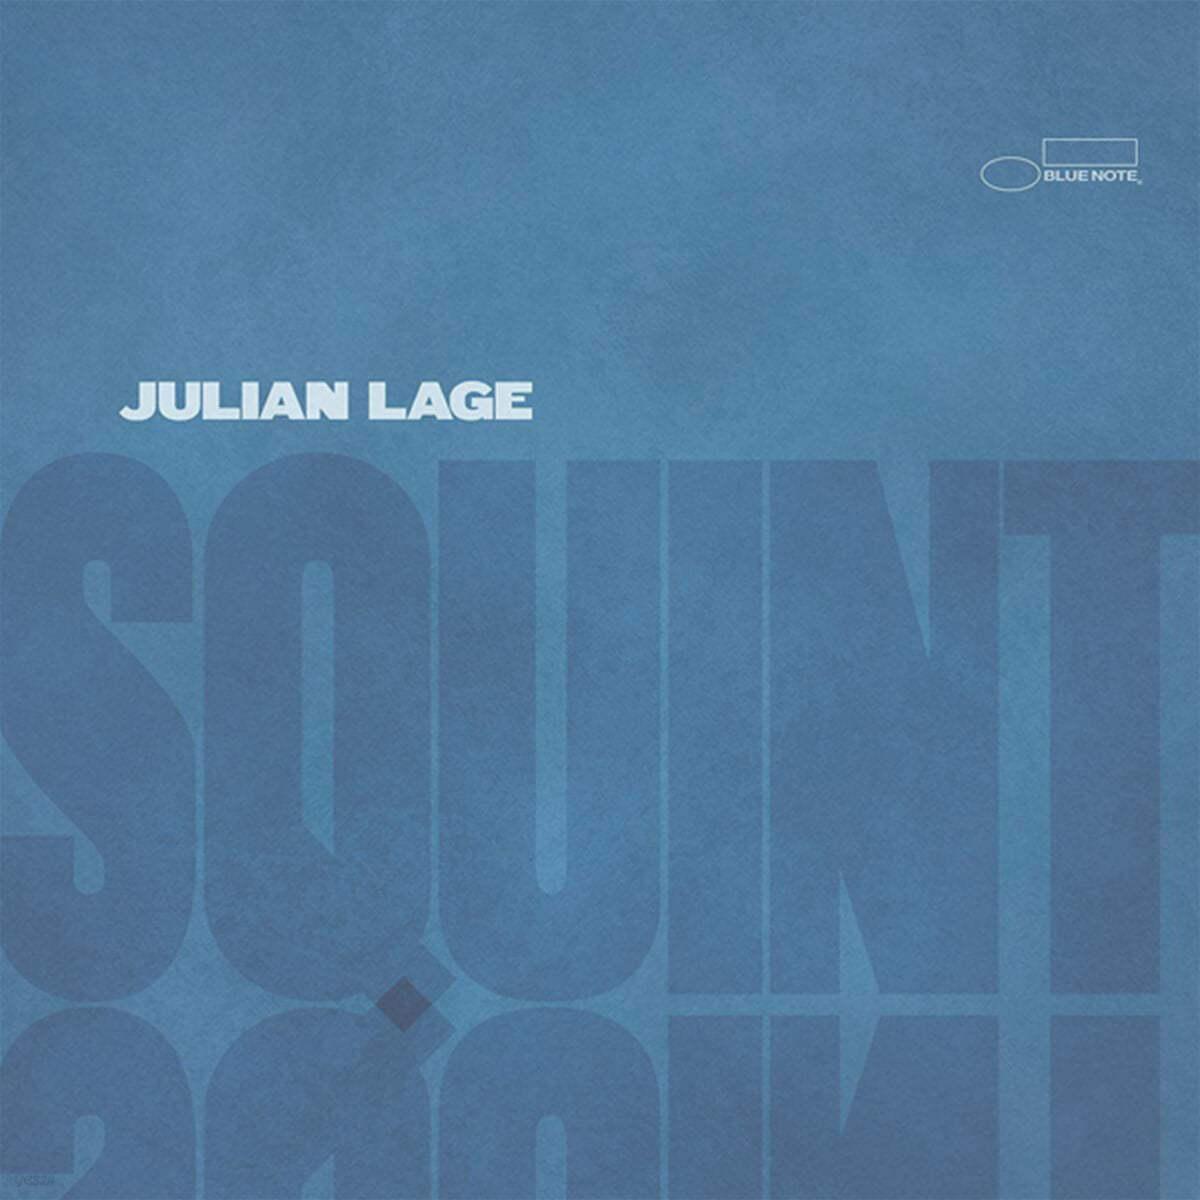 Julian Lage (줄리안 라지) - Squint